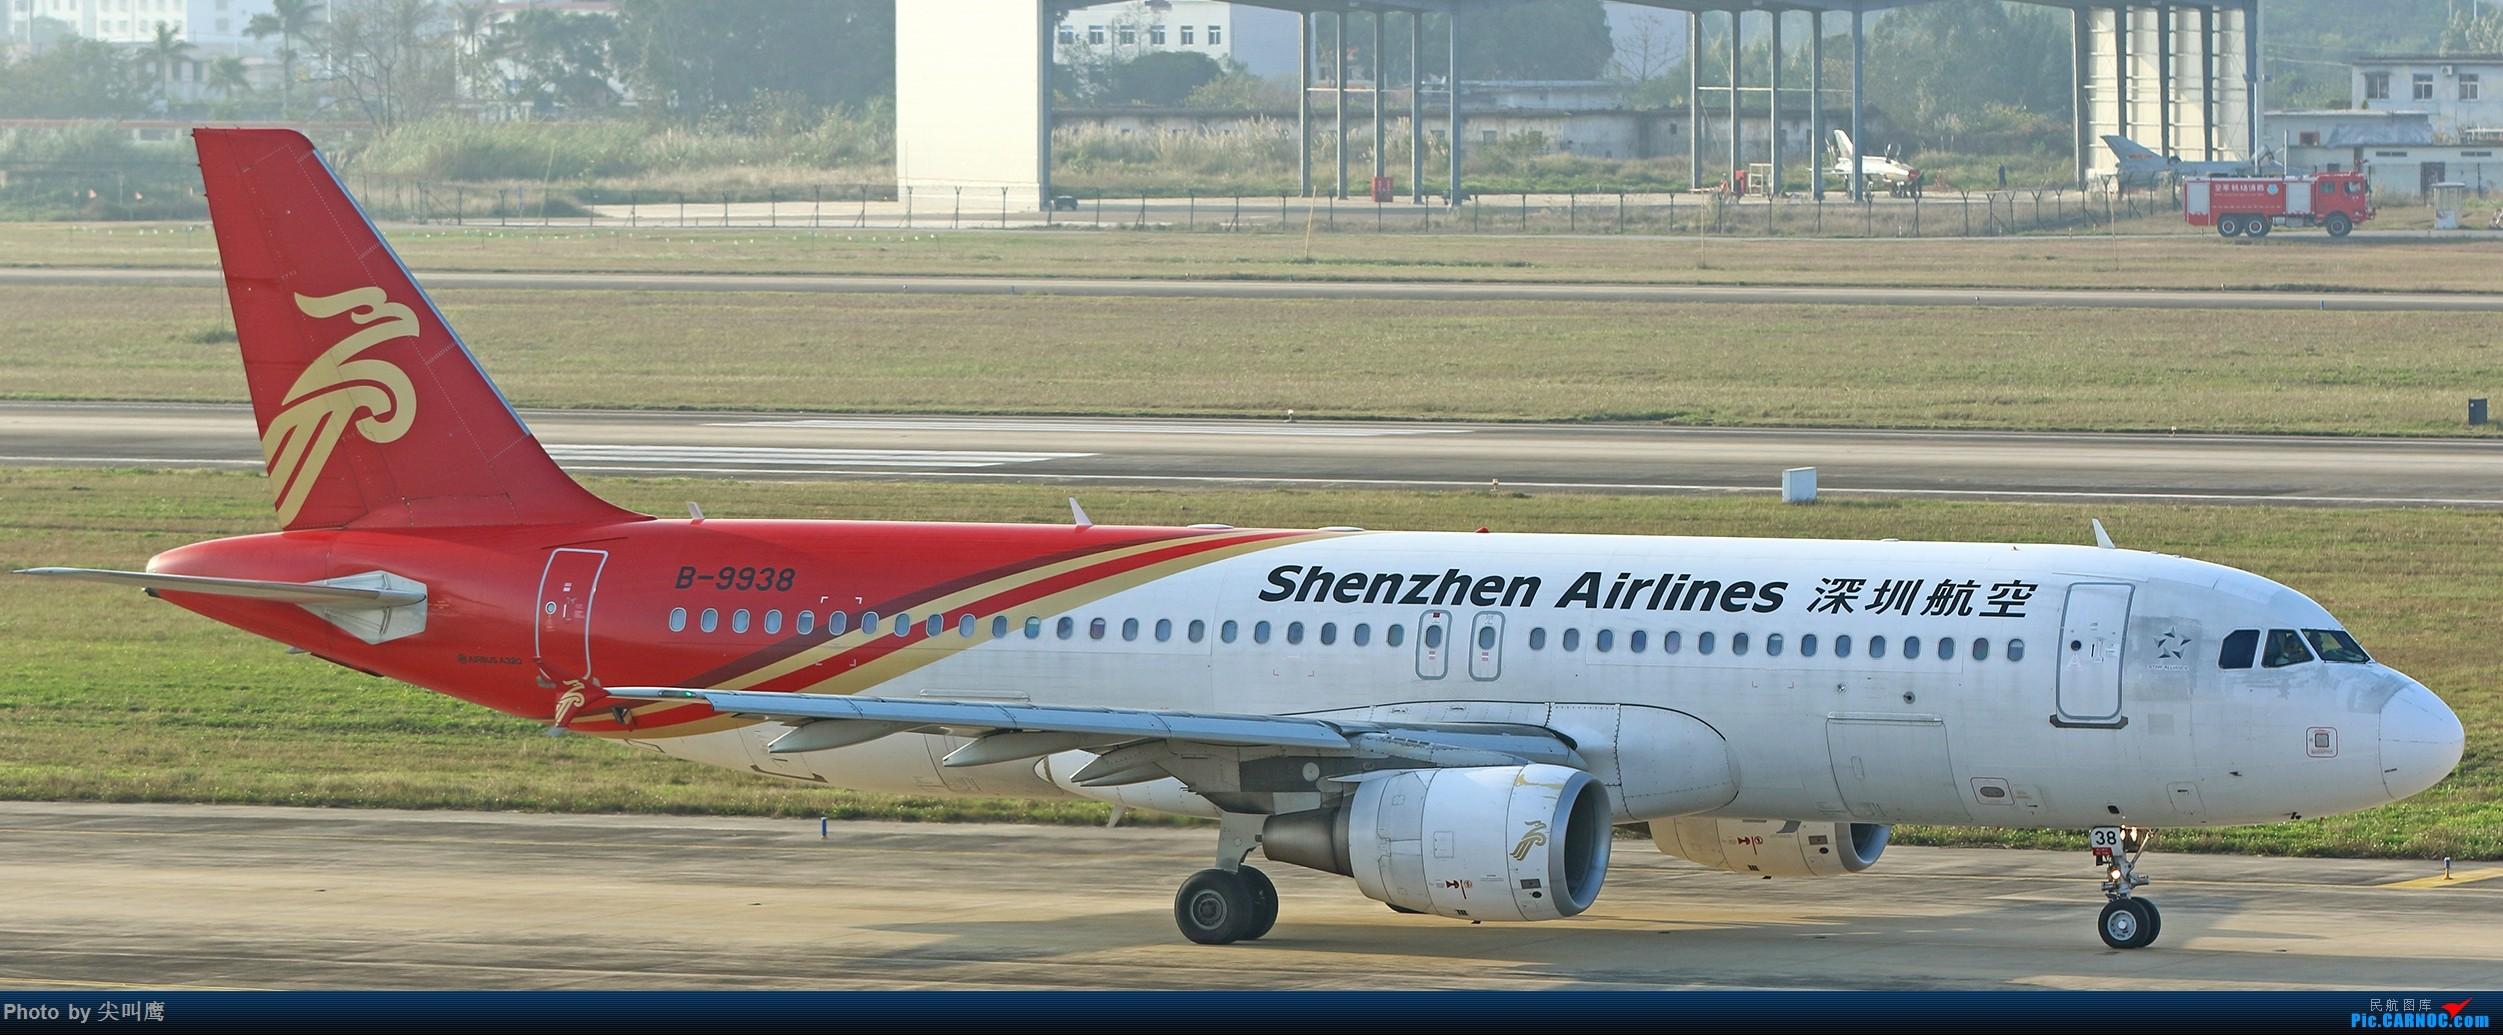 Re:[原创]NNG日常几张杂图 AIRBUS A320-200 B-9938 中国南宁吴圩国际机场